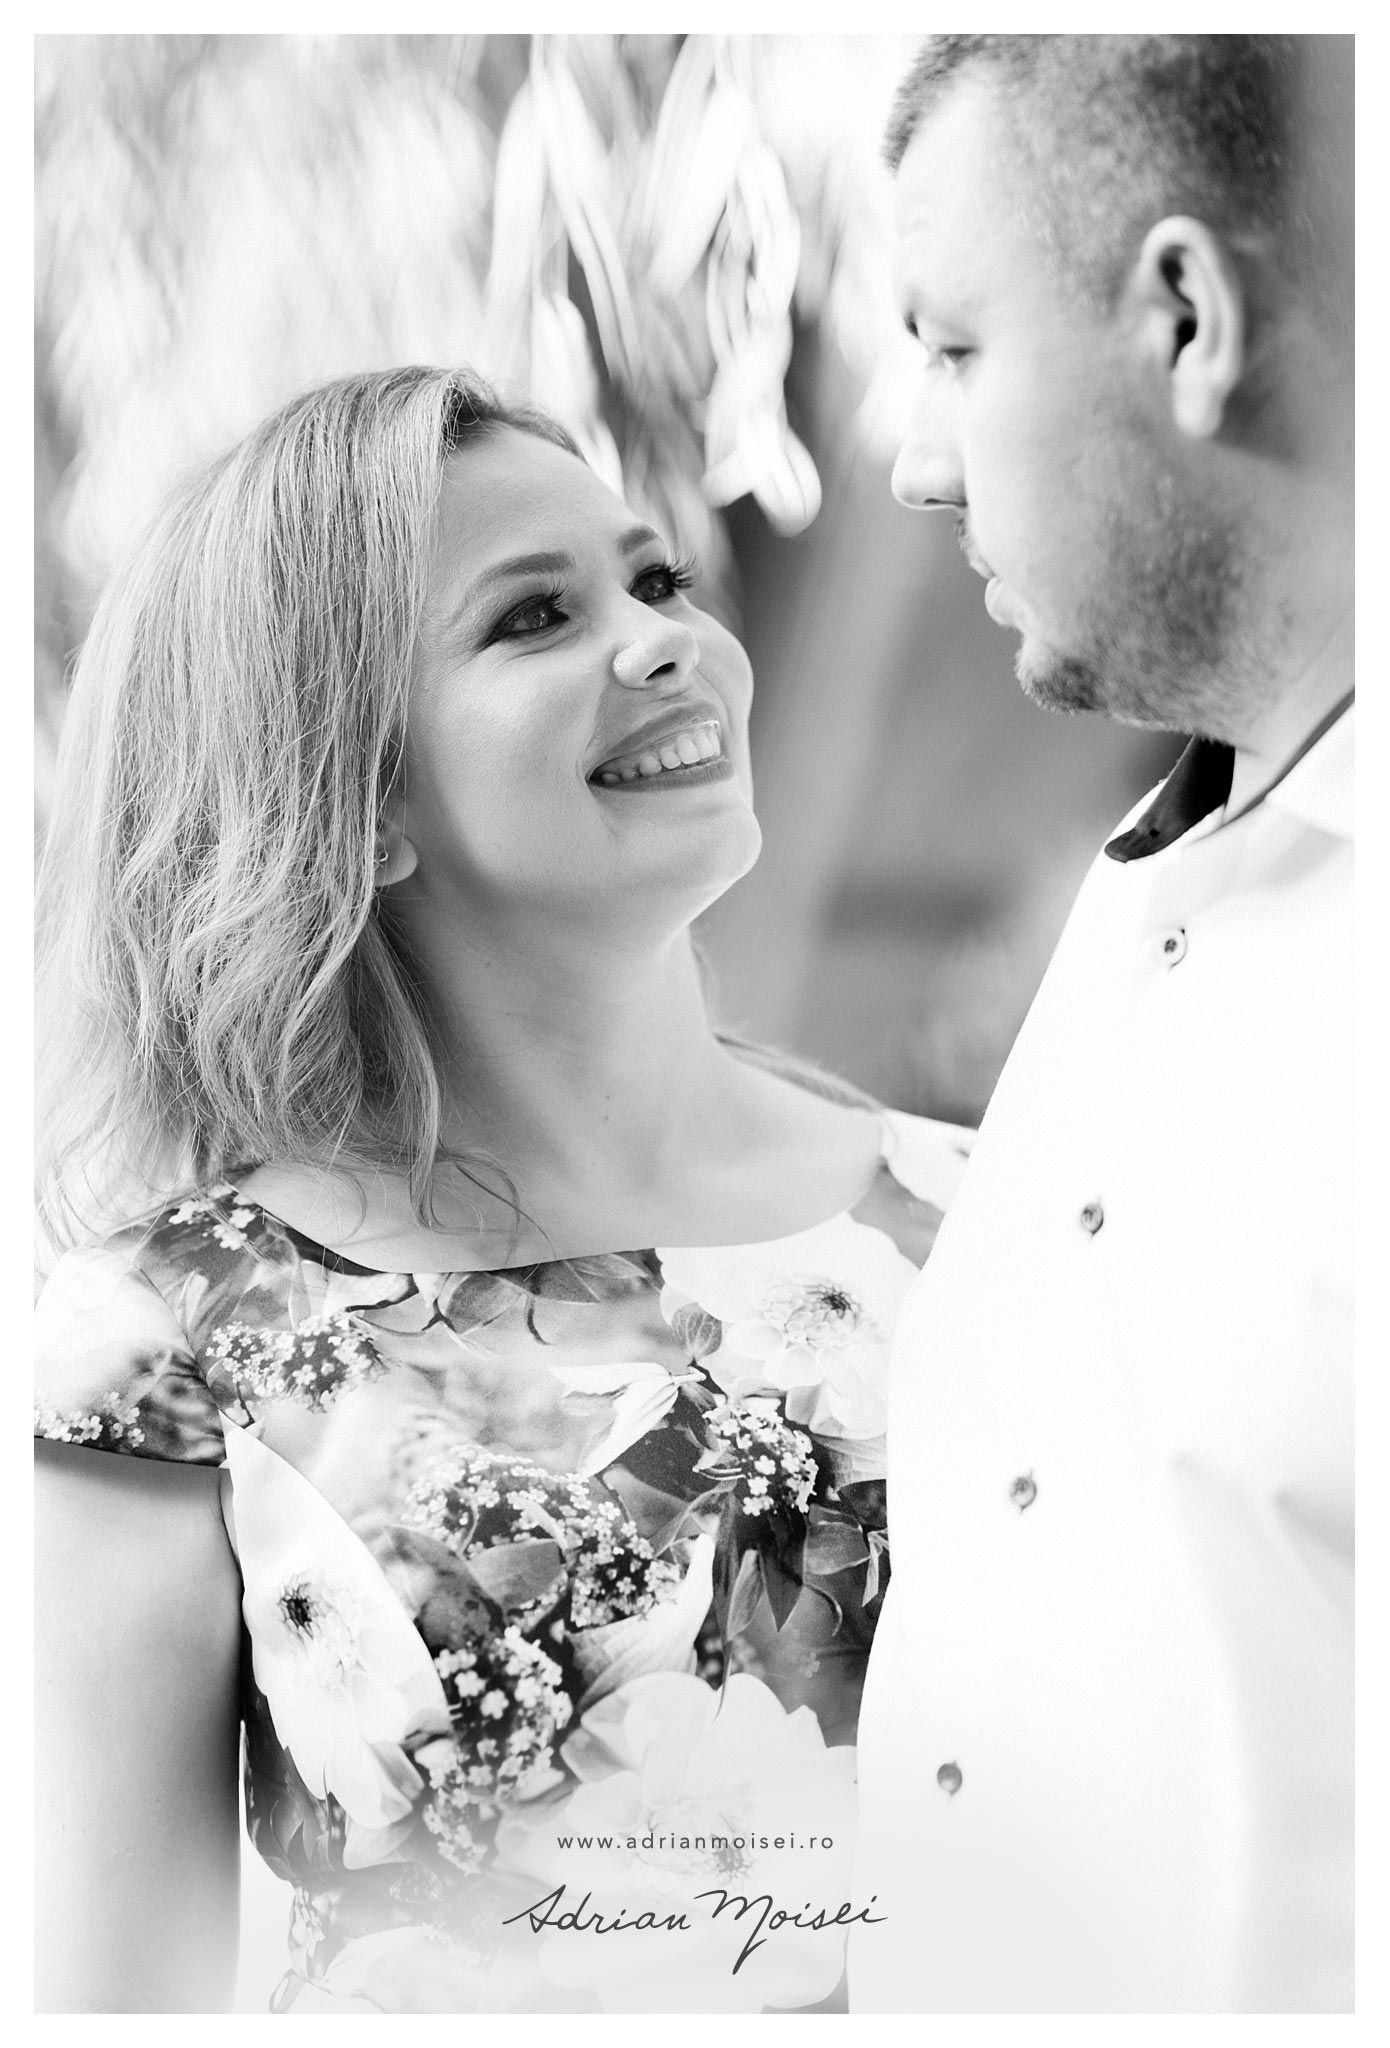 Fotograf nunta Iasi, fotografie de petrecere Iasi, fotografie de familie Iasi, Fine art, artist fotograf Adrian Moisei